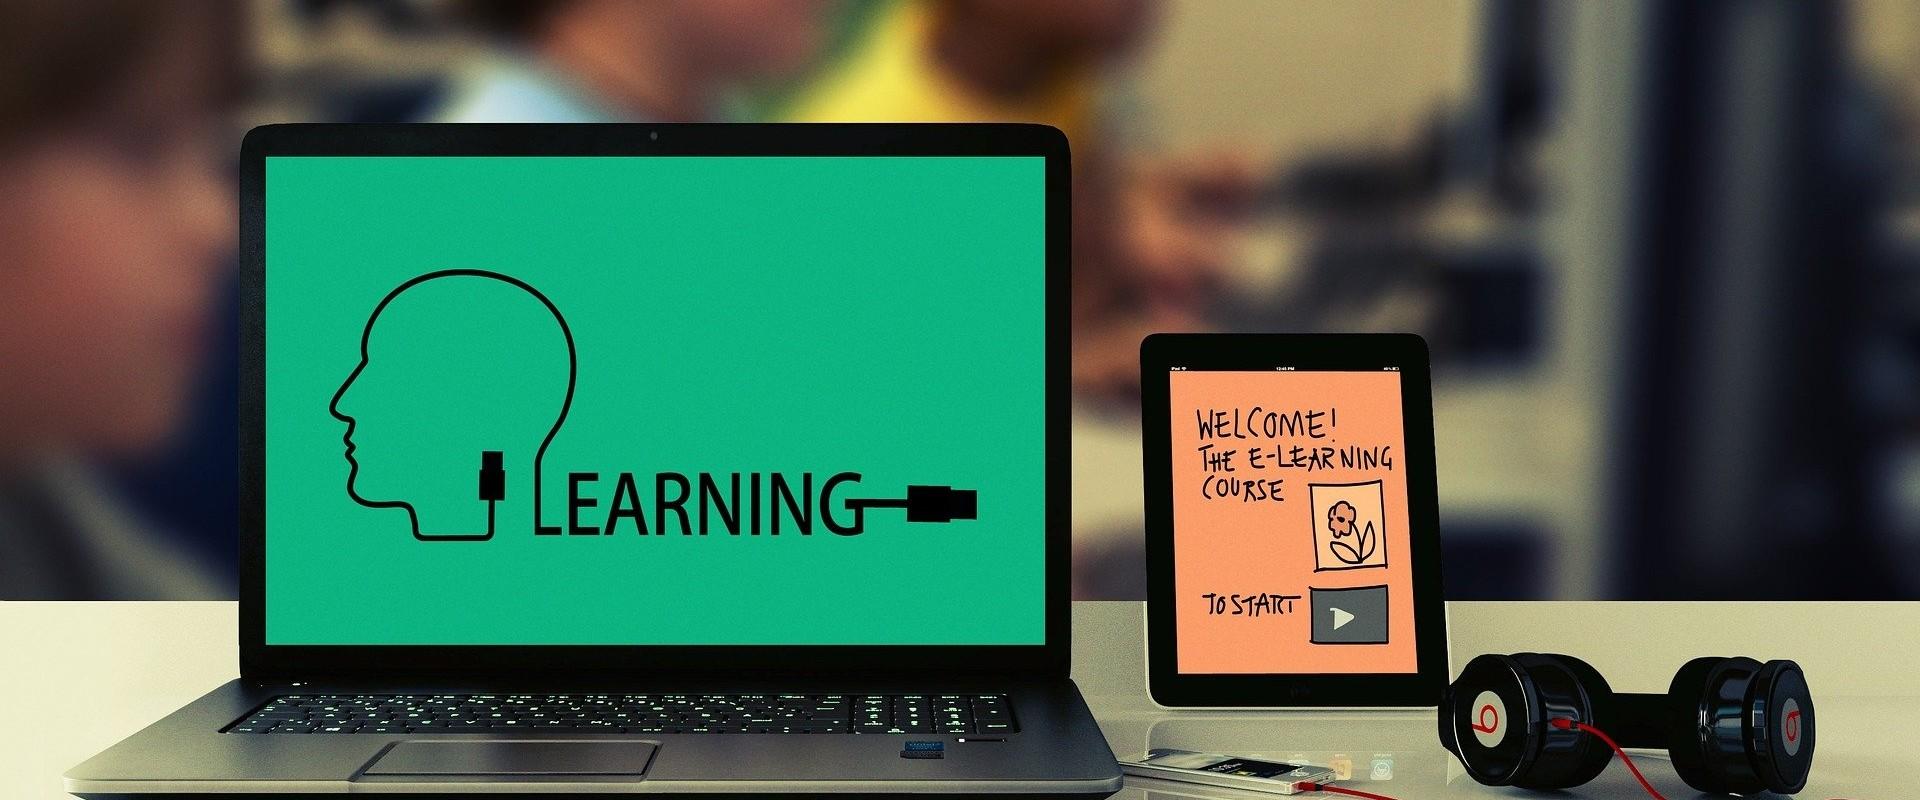 Zelf een e-learning maken